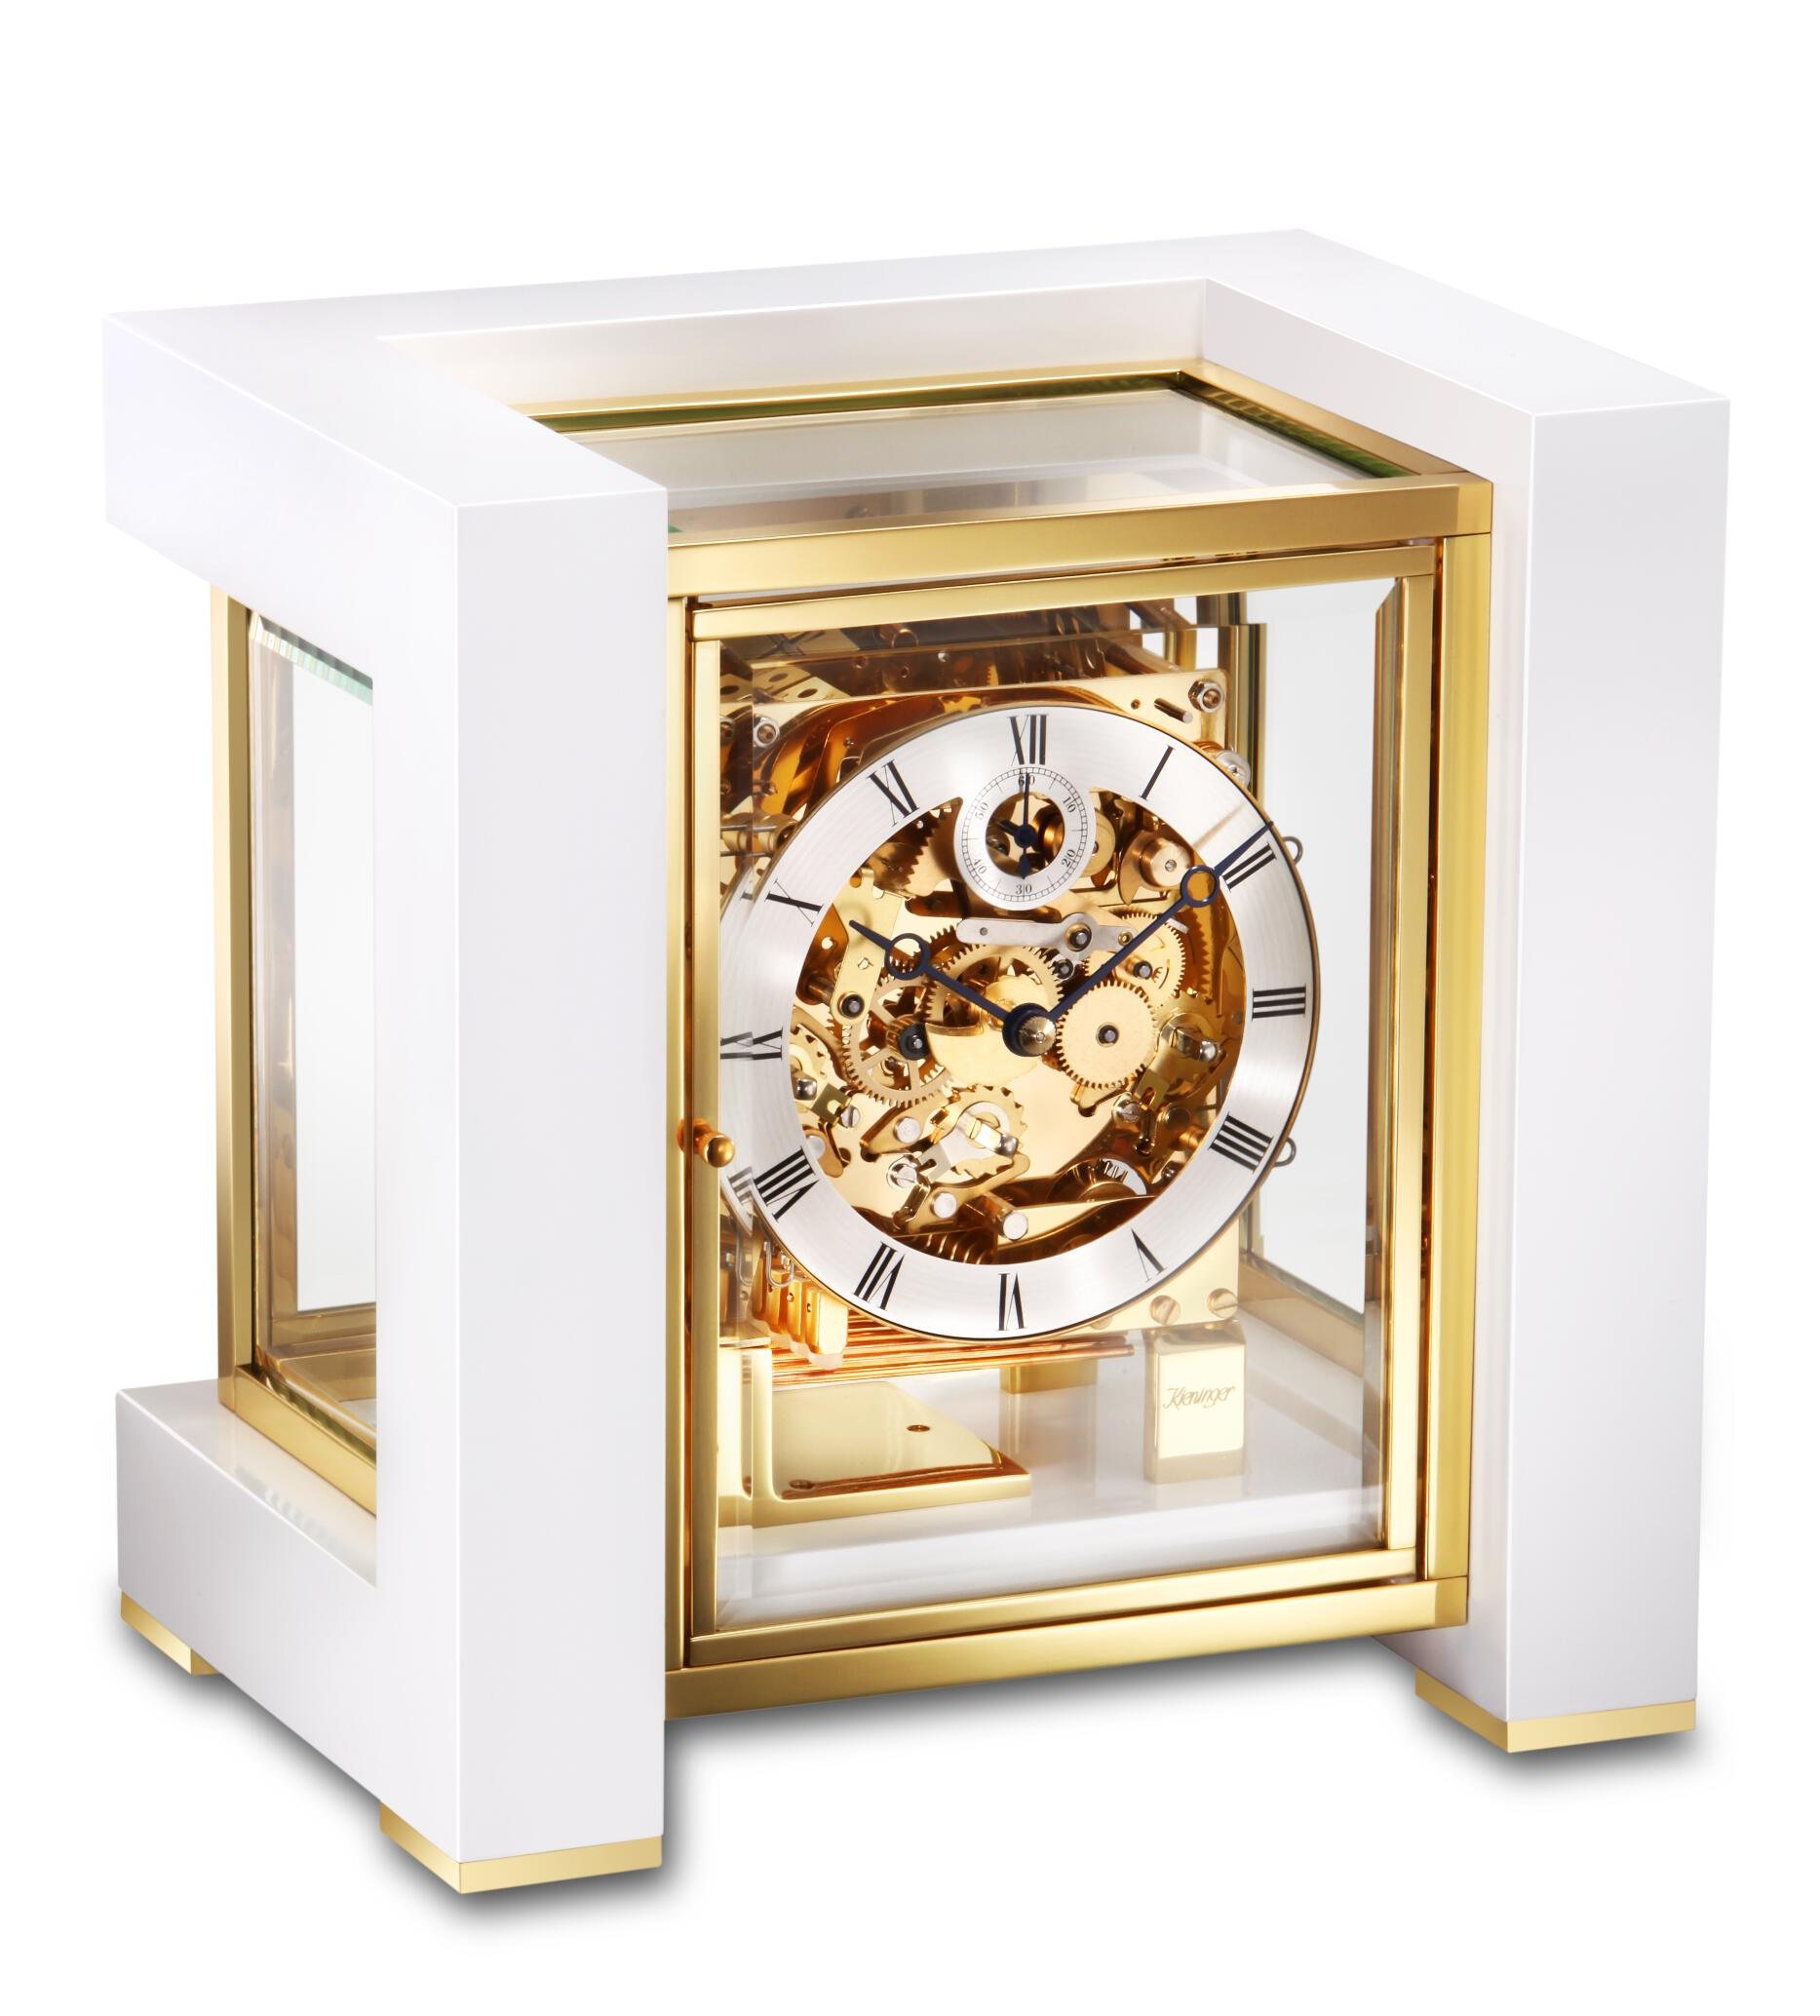 Kieninger suburban clock in berea ohio since 1953 1266 95 01 amipublicfo Images